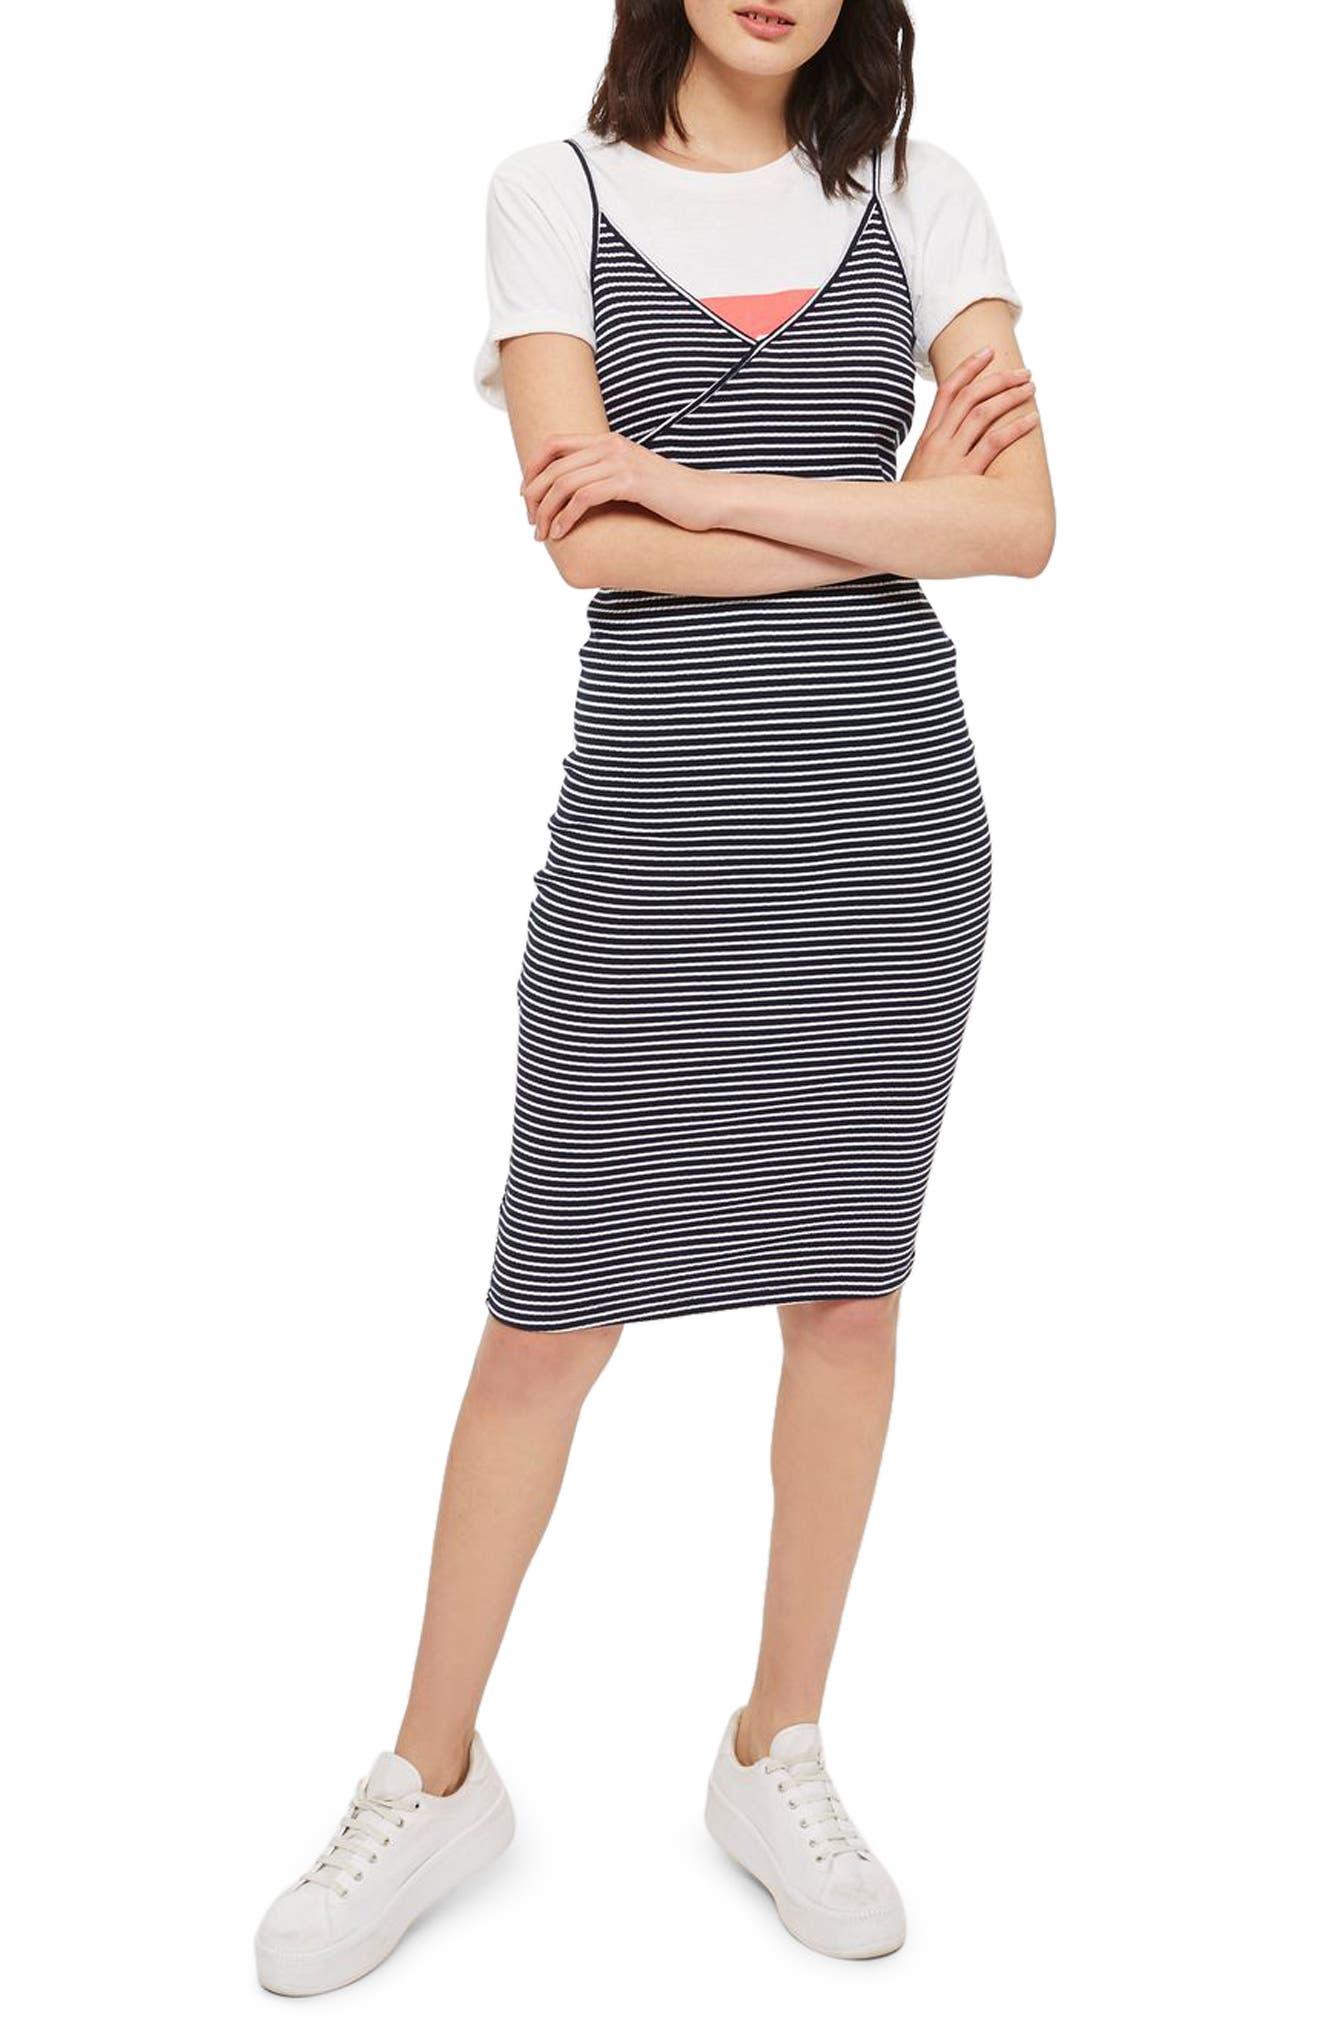 Kaia Stripe Tank Dress,                             Main thumbnail 1, color,                             410